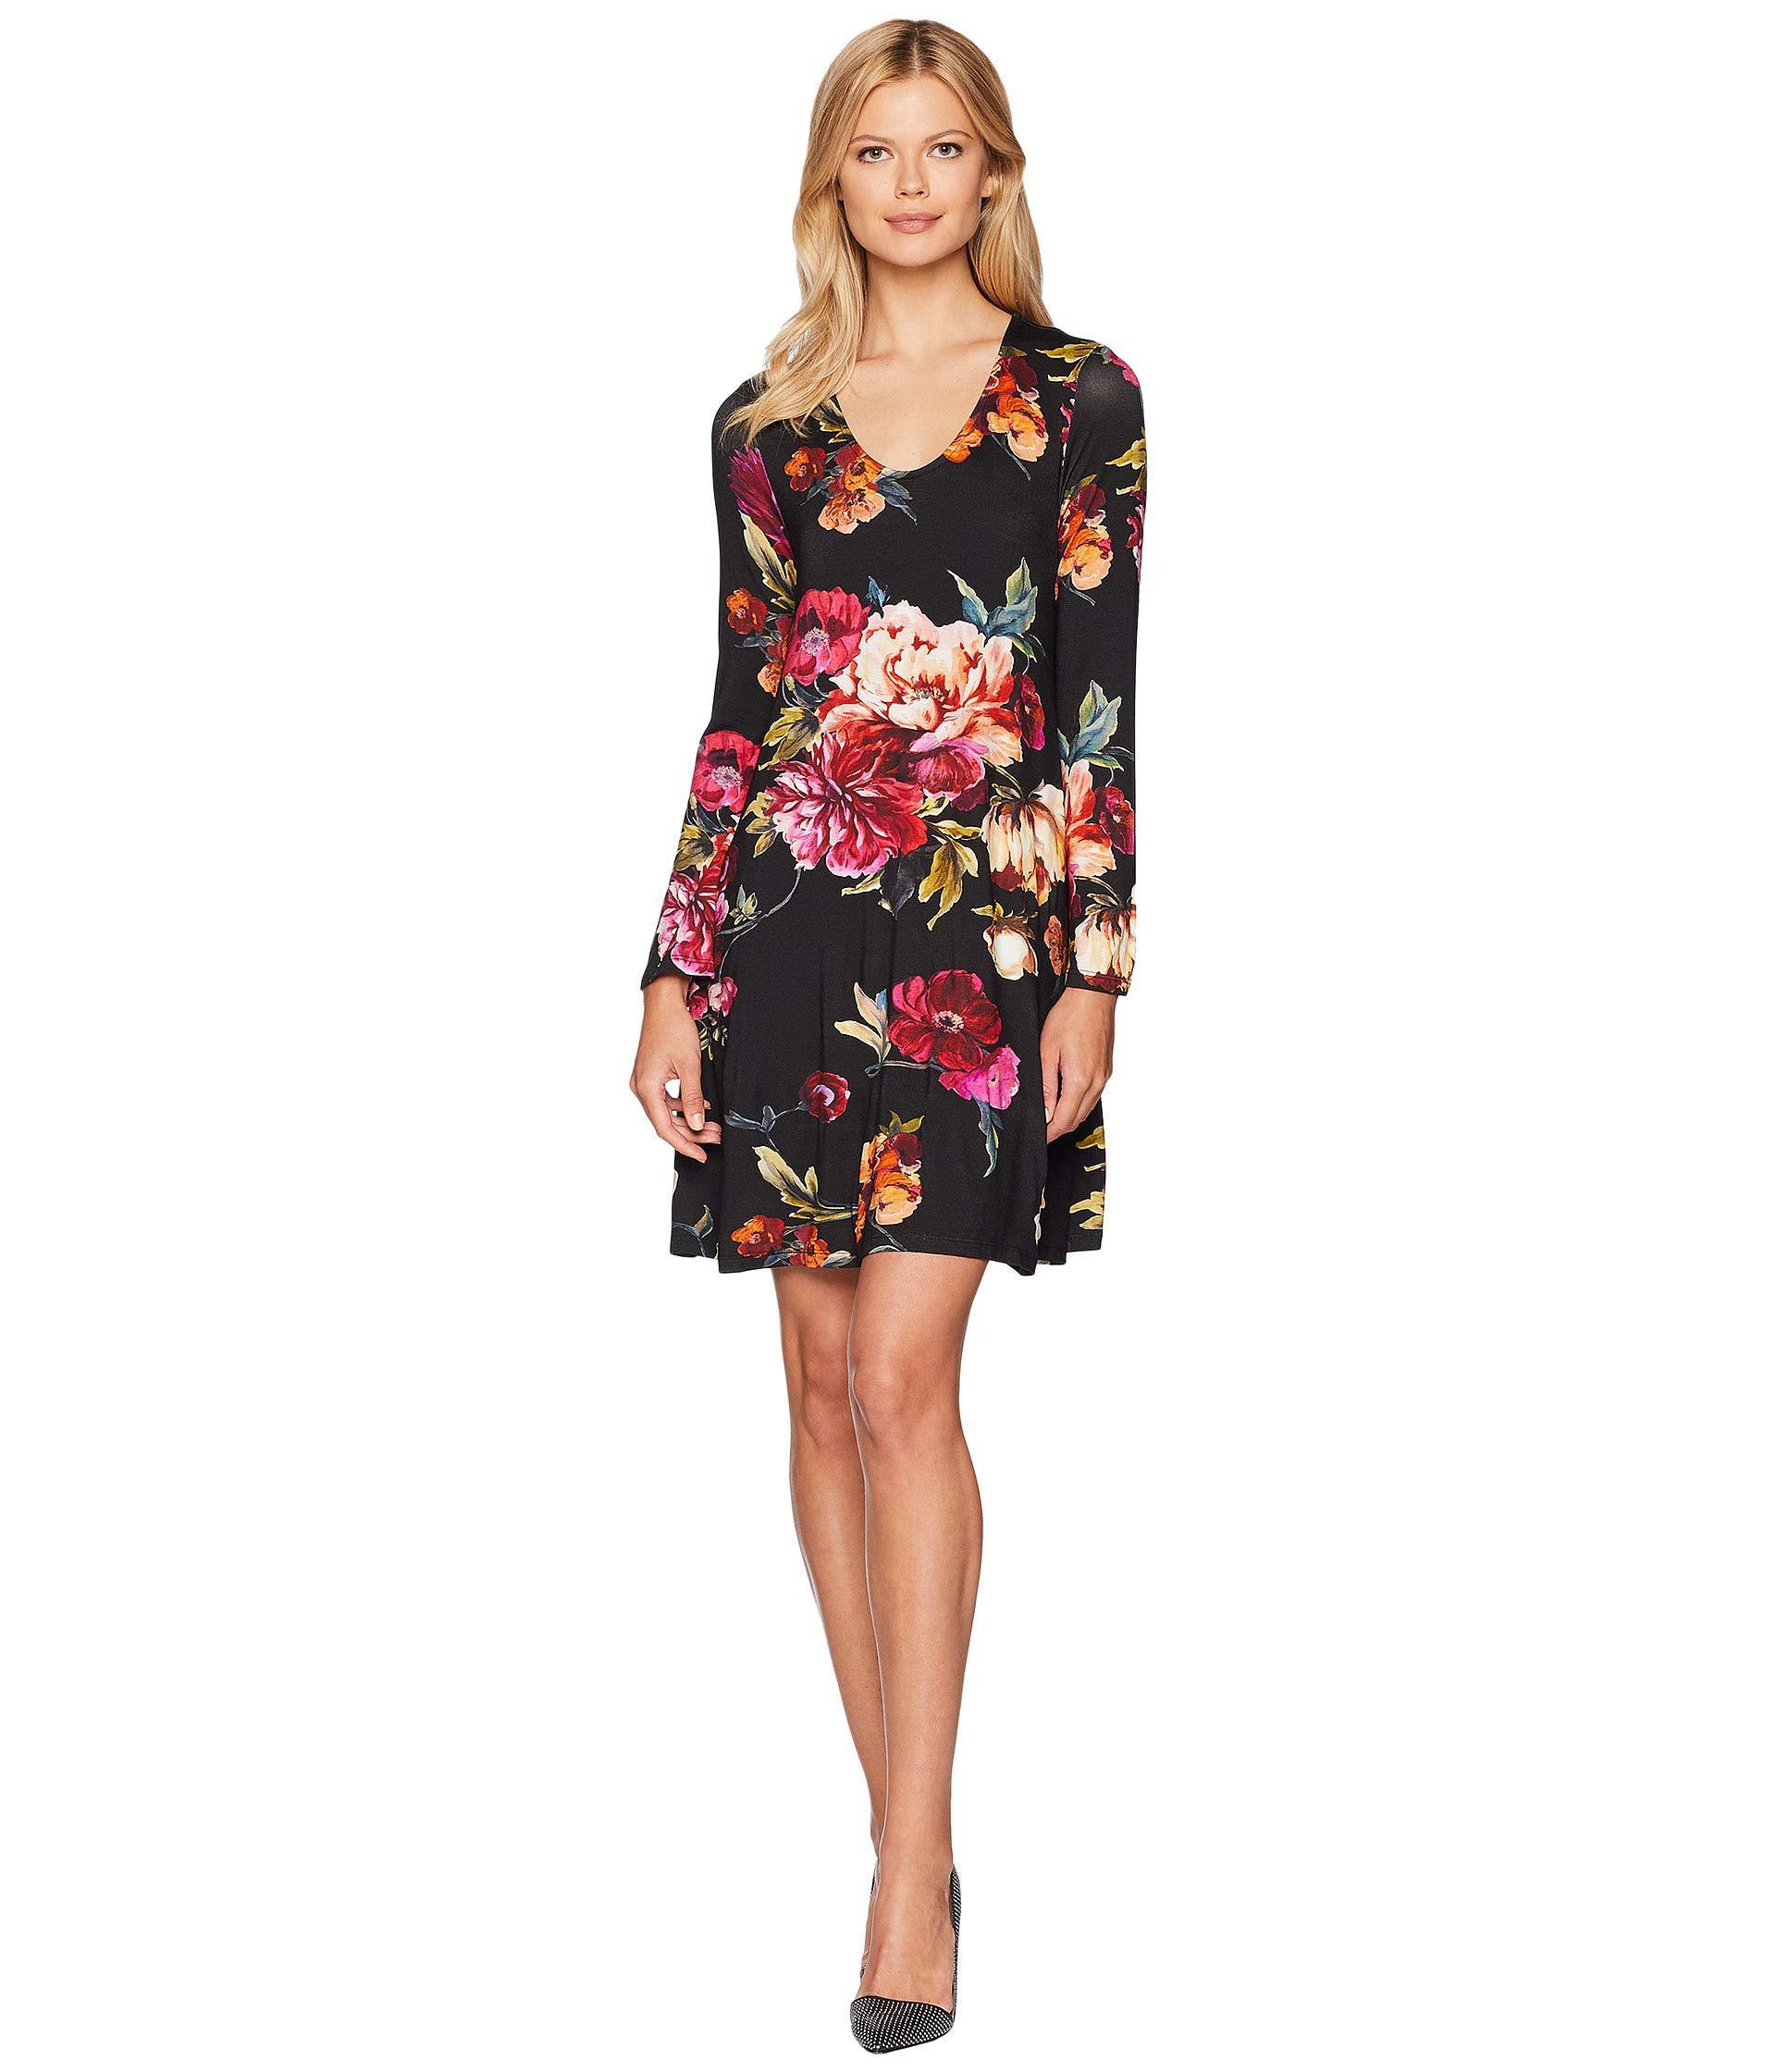 9064a8aadee Lyst - Karen Kane Floral Taylor Dress - Save 23%